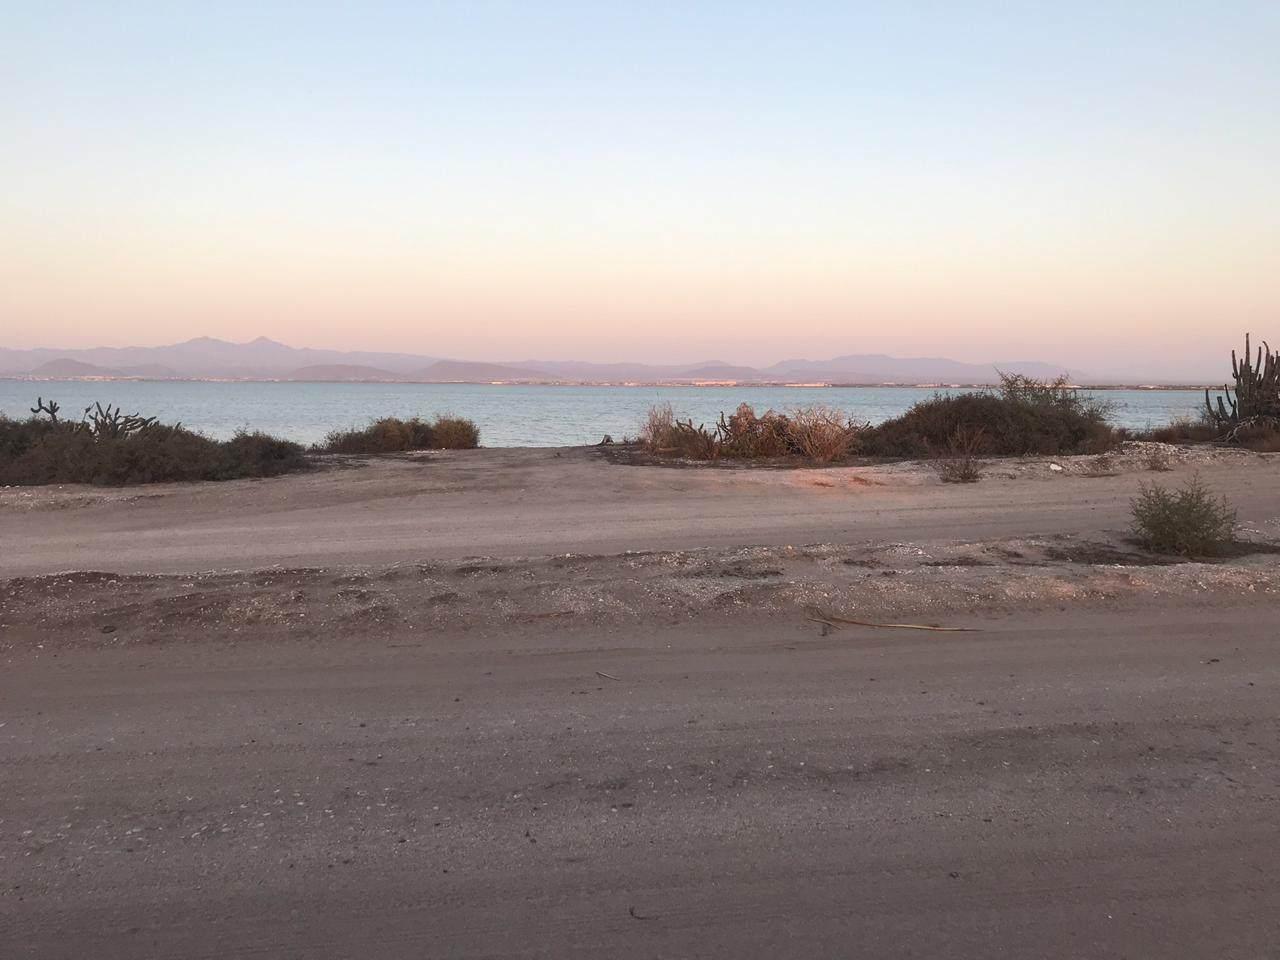 Paseo Costero Playa Centenario Lote 8 - Photo 1